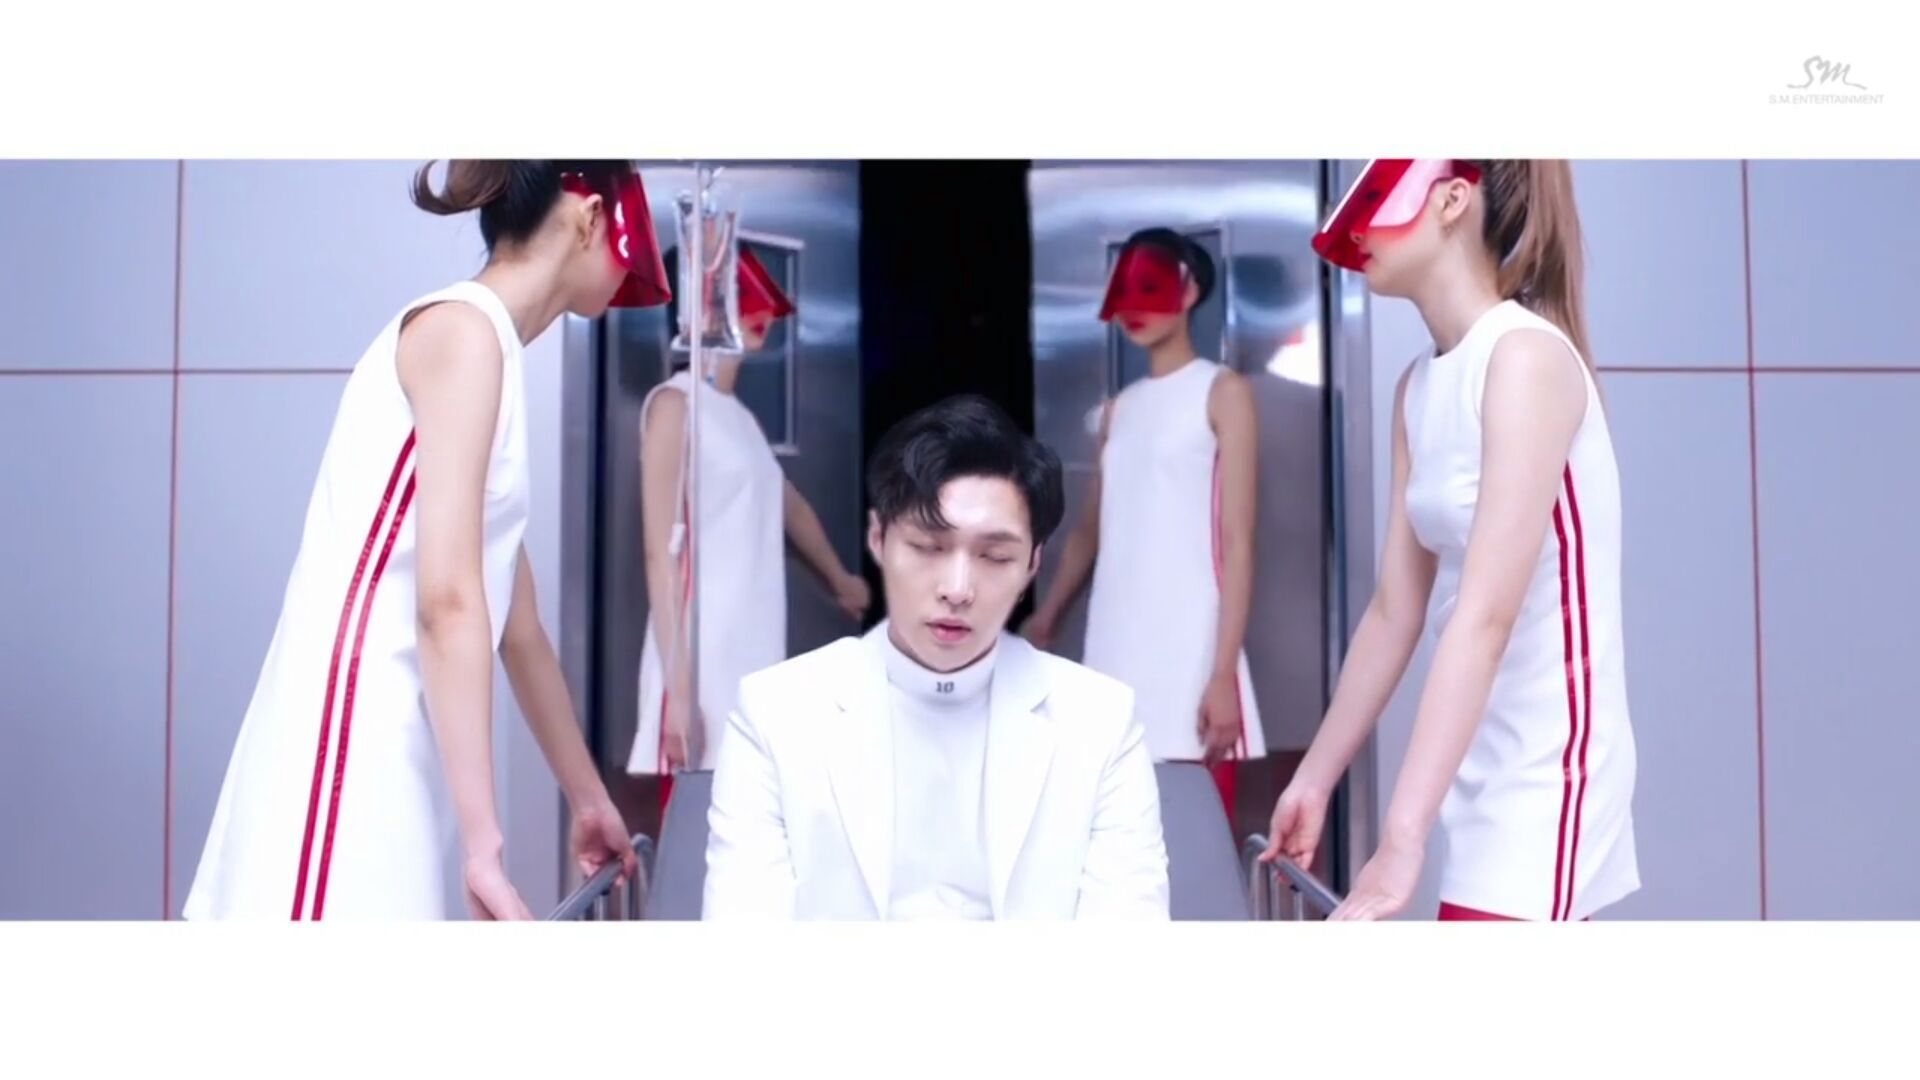 Lay: saya kat mana ni? Kenapa kepala saya macam berpusing je ni?